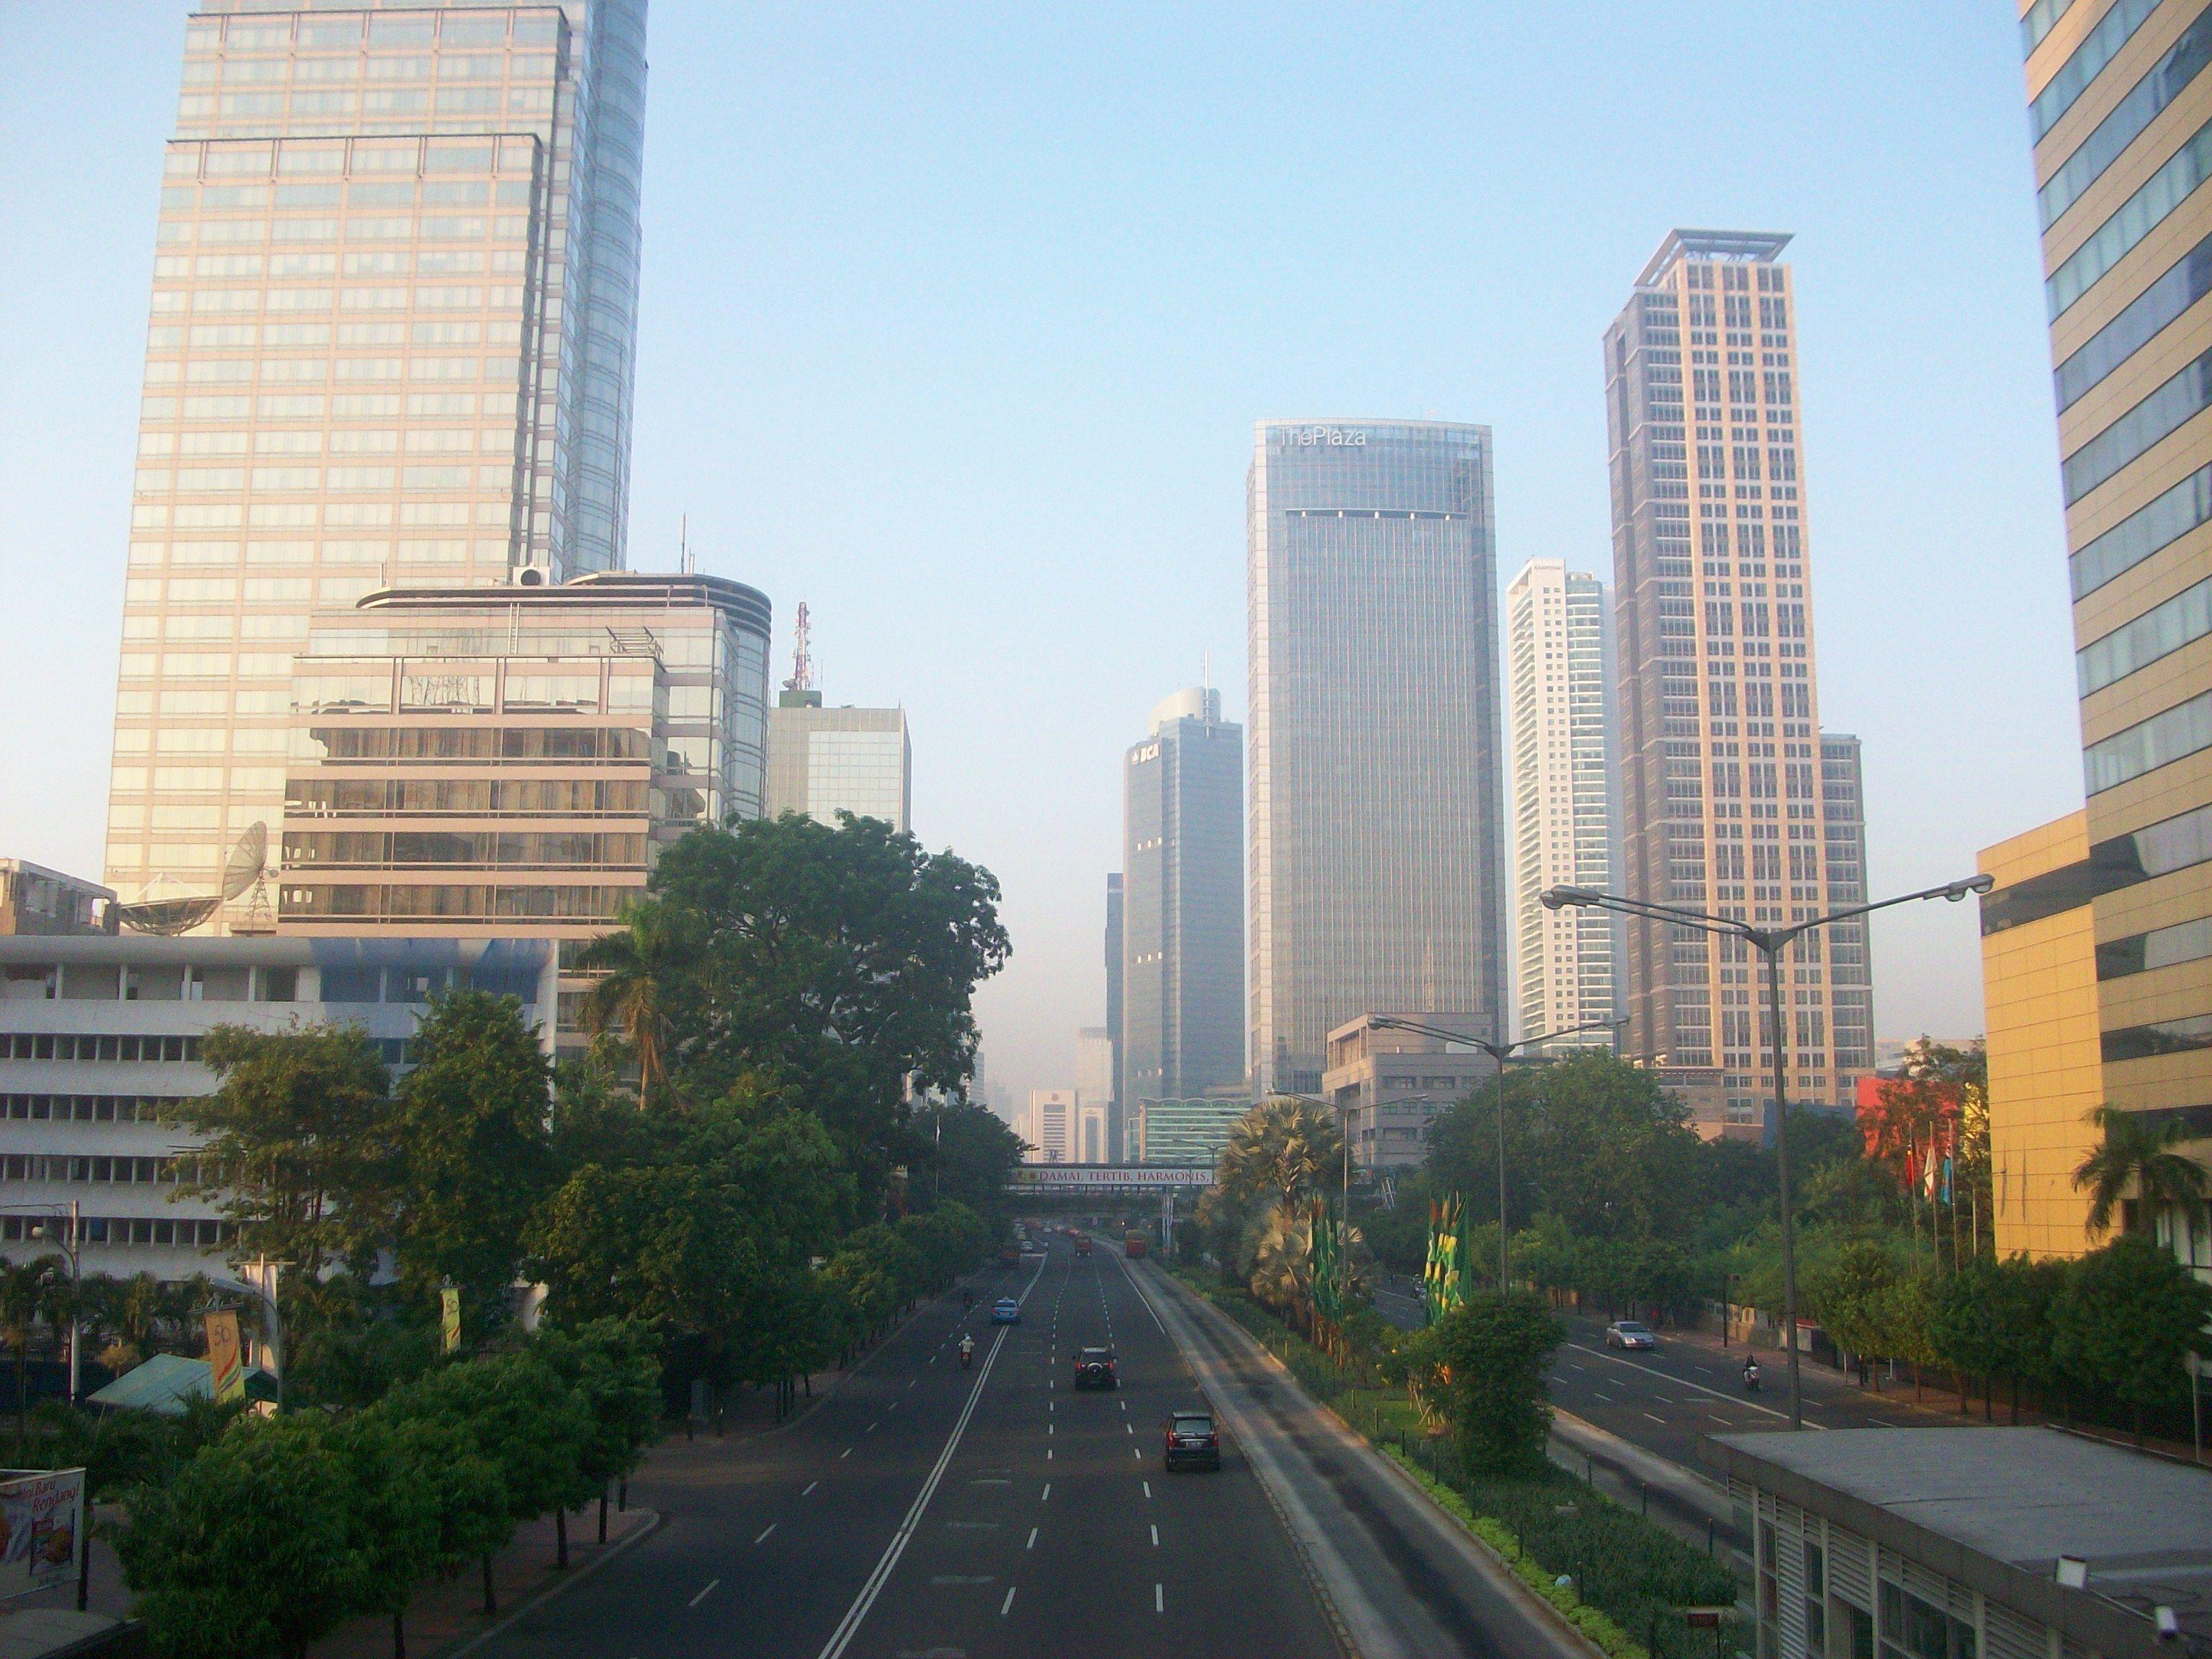 Pemandangan di Jakarta | Pemandangan, Indonesia, Kepulauan